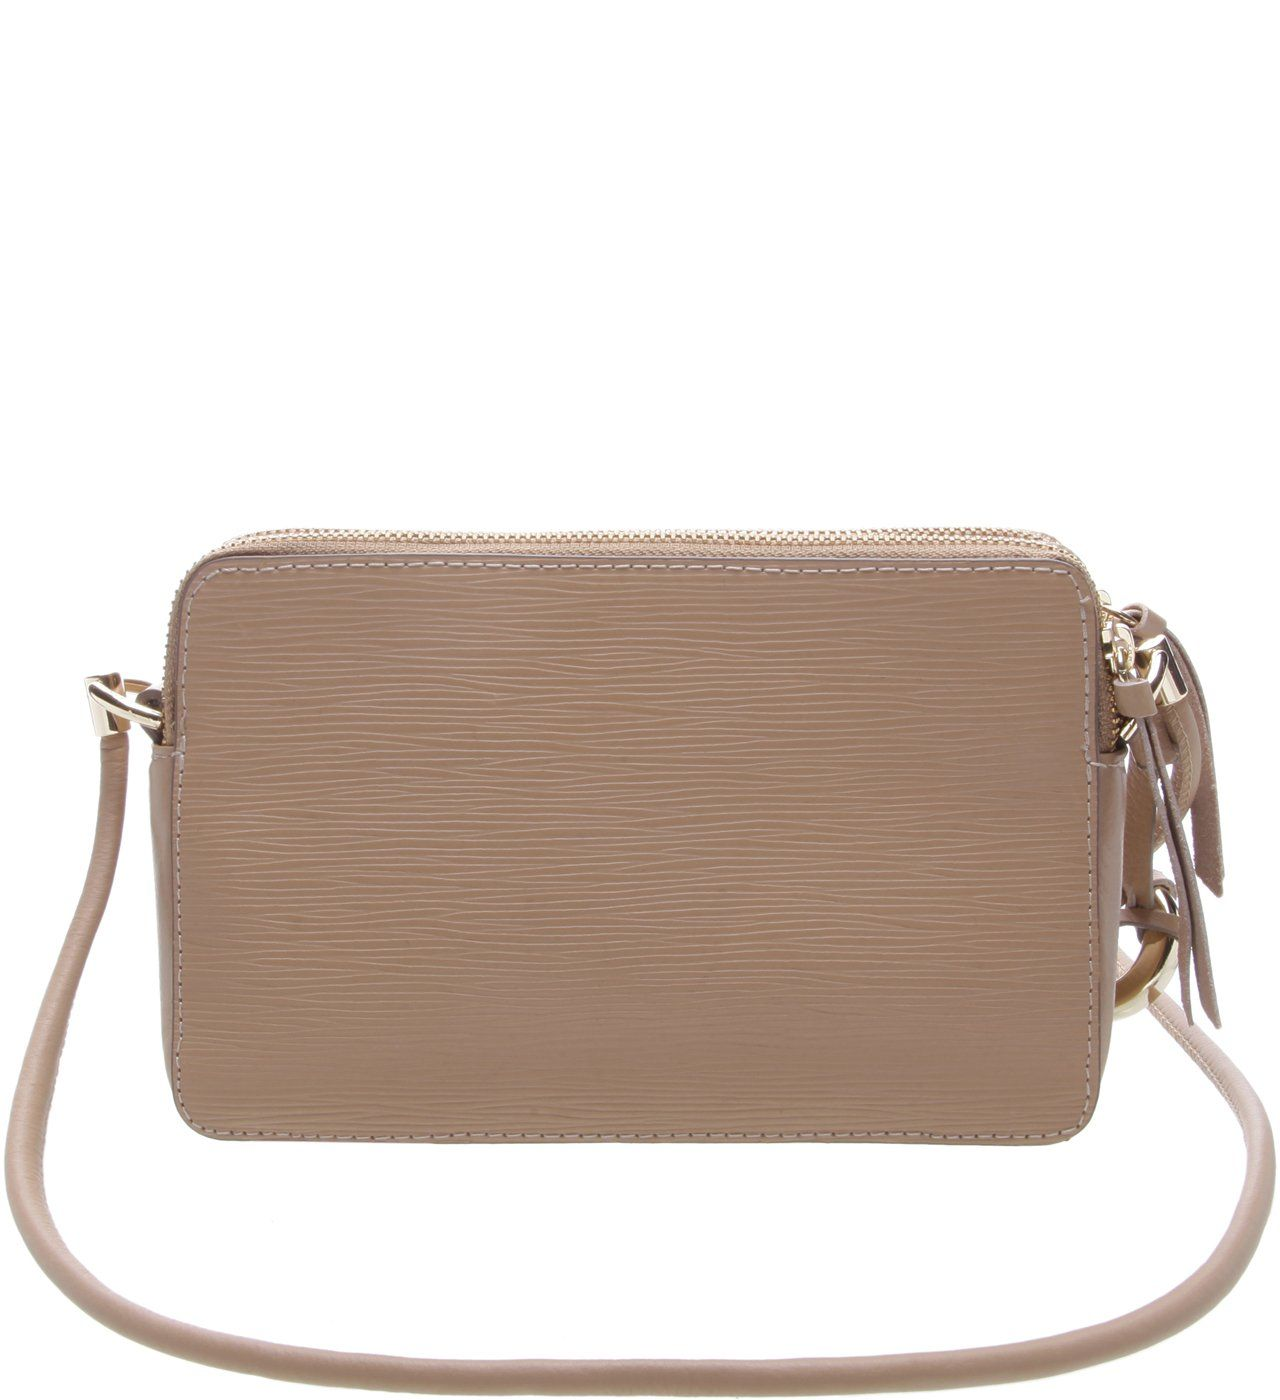 68ce1d678 Bolsa Tiracolo Couro Wave Abraccio Pale Beige | BOLSAS | Bags e Fashion